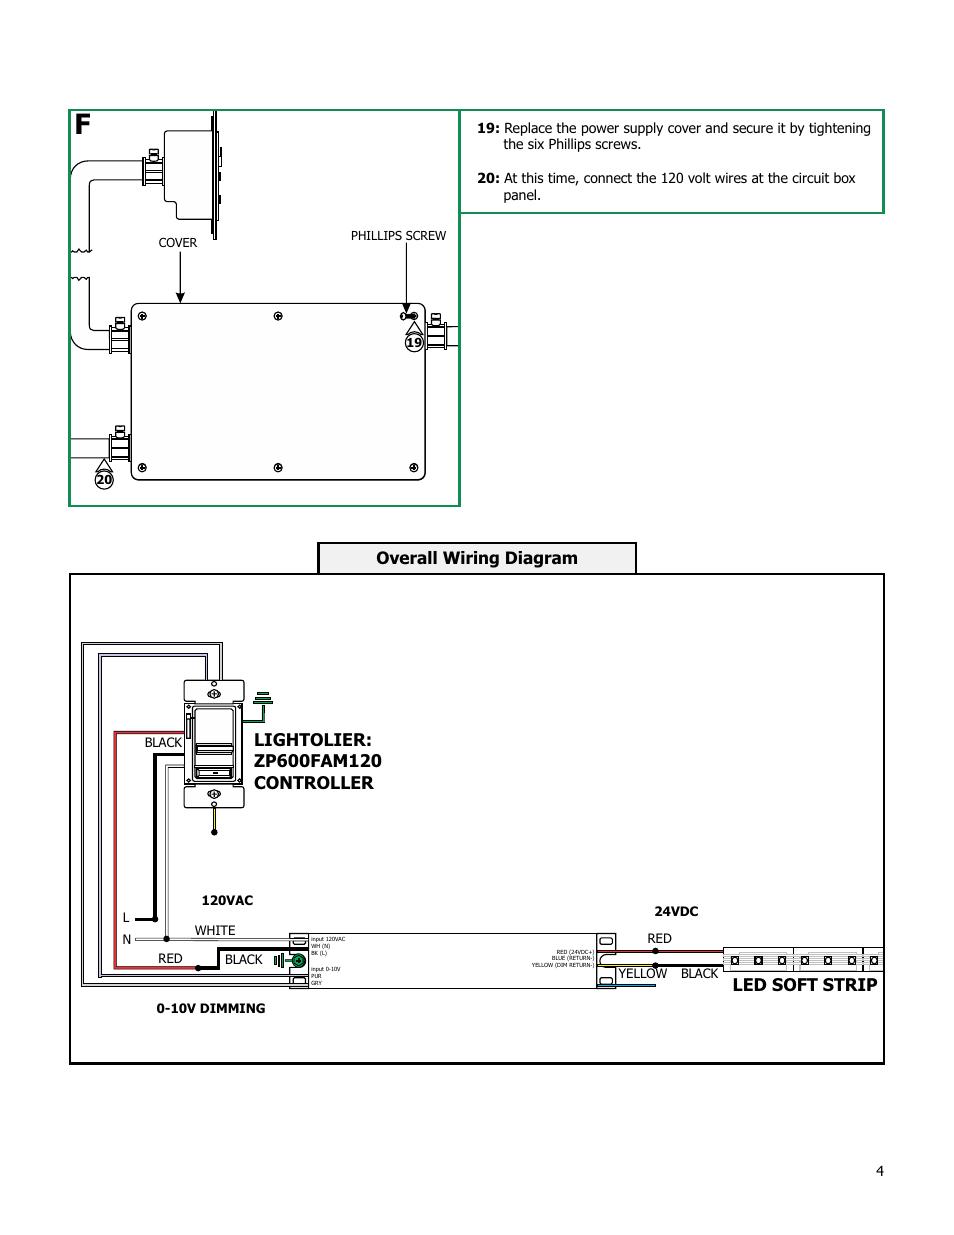 overall wiring diagram edge lighting psb 96w 010 24vdc. Black Bedroom Furniture Sets. Home Design Ideas